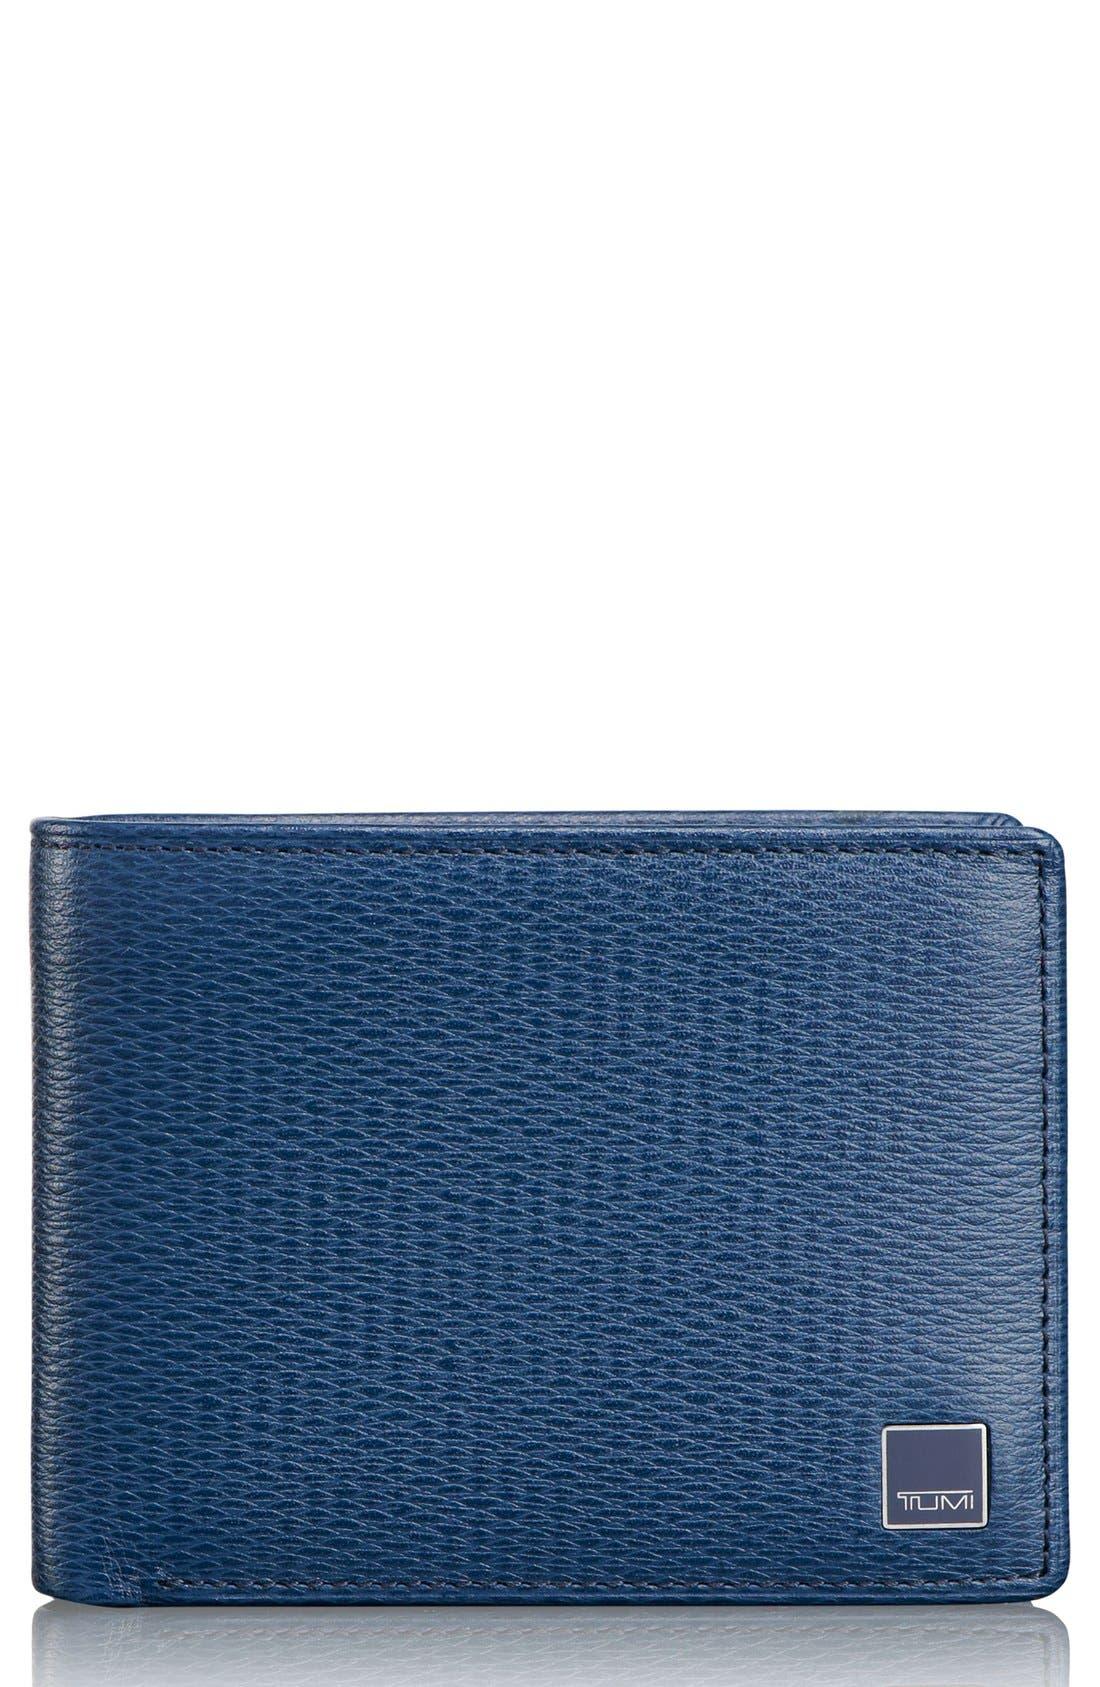 Main Image - Tumi 'Monaco' Double Billfold Wallet